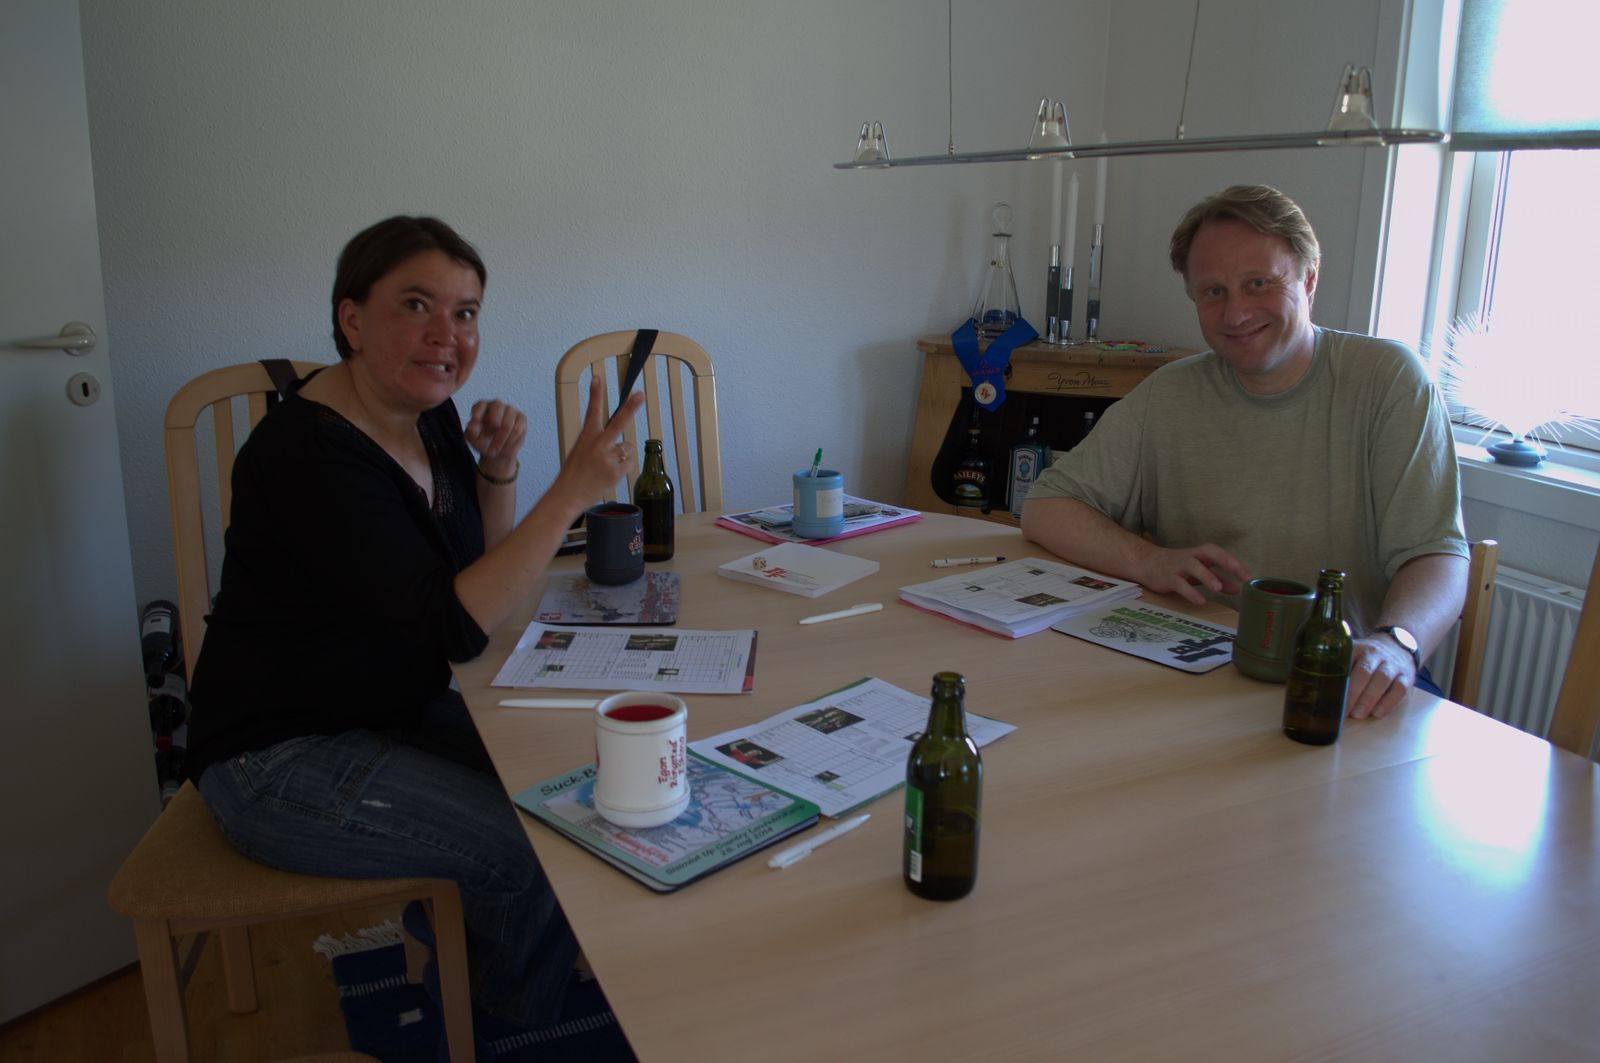 2014-07-12-1829_-_Anna-Hessler_Egon-Ringsted